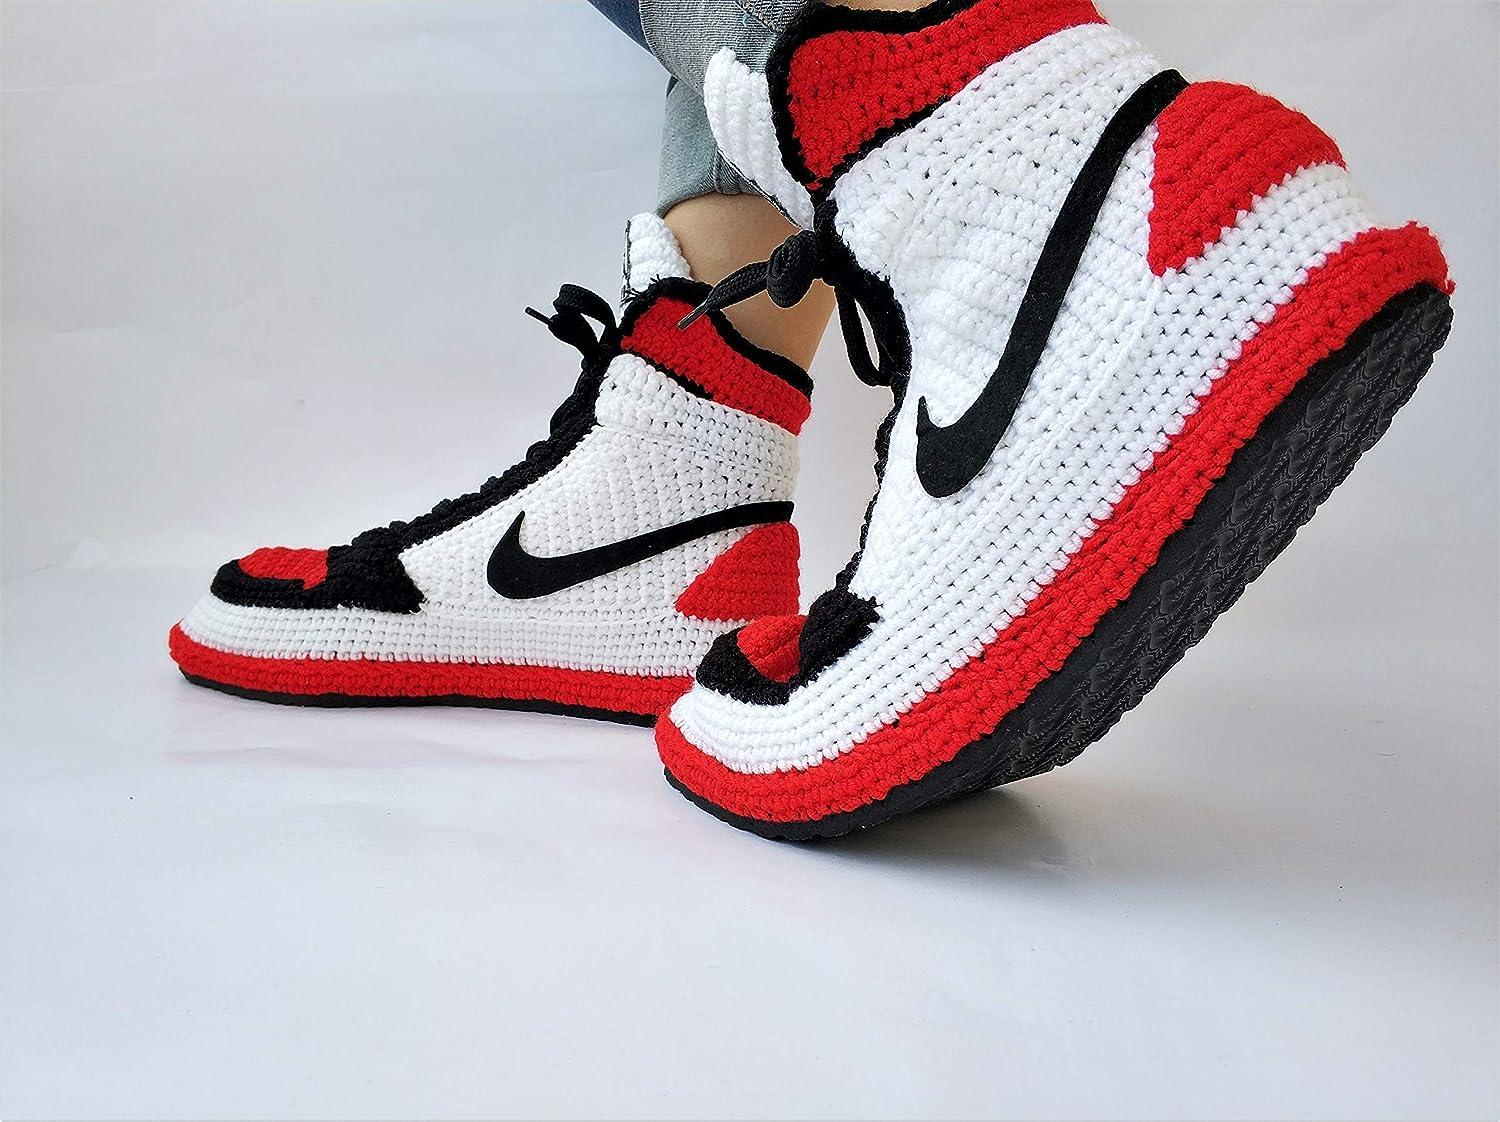 ec79efe3972 Amazon.com  Knitting Style Air Jordan 1 Retro High OG